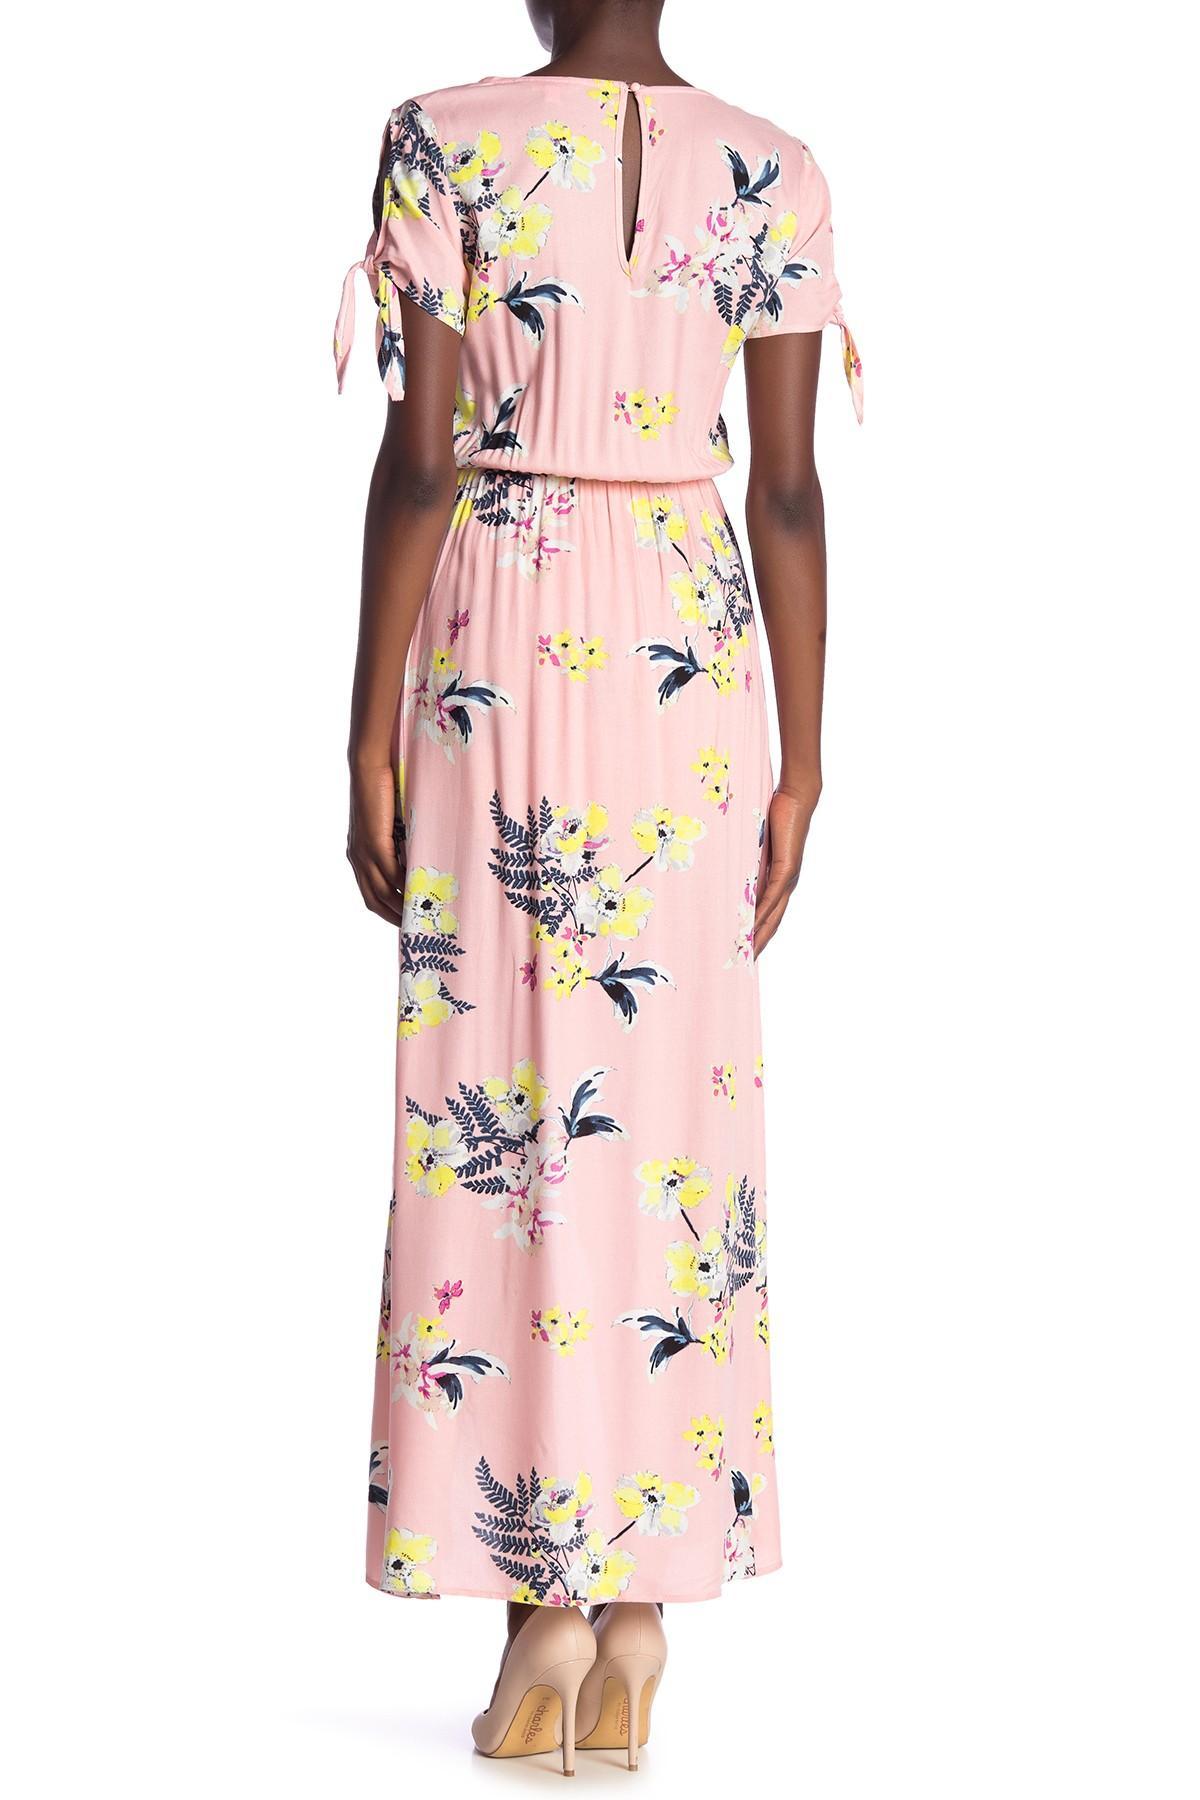 cbdce6a5739 BB Dakota - Pink Anaya Floral Print Overlay Romper - Lyst. View fullscreen